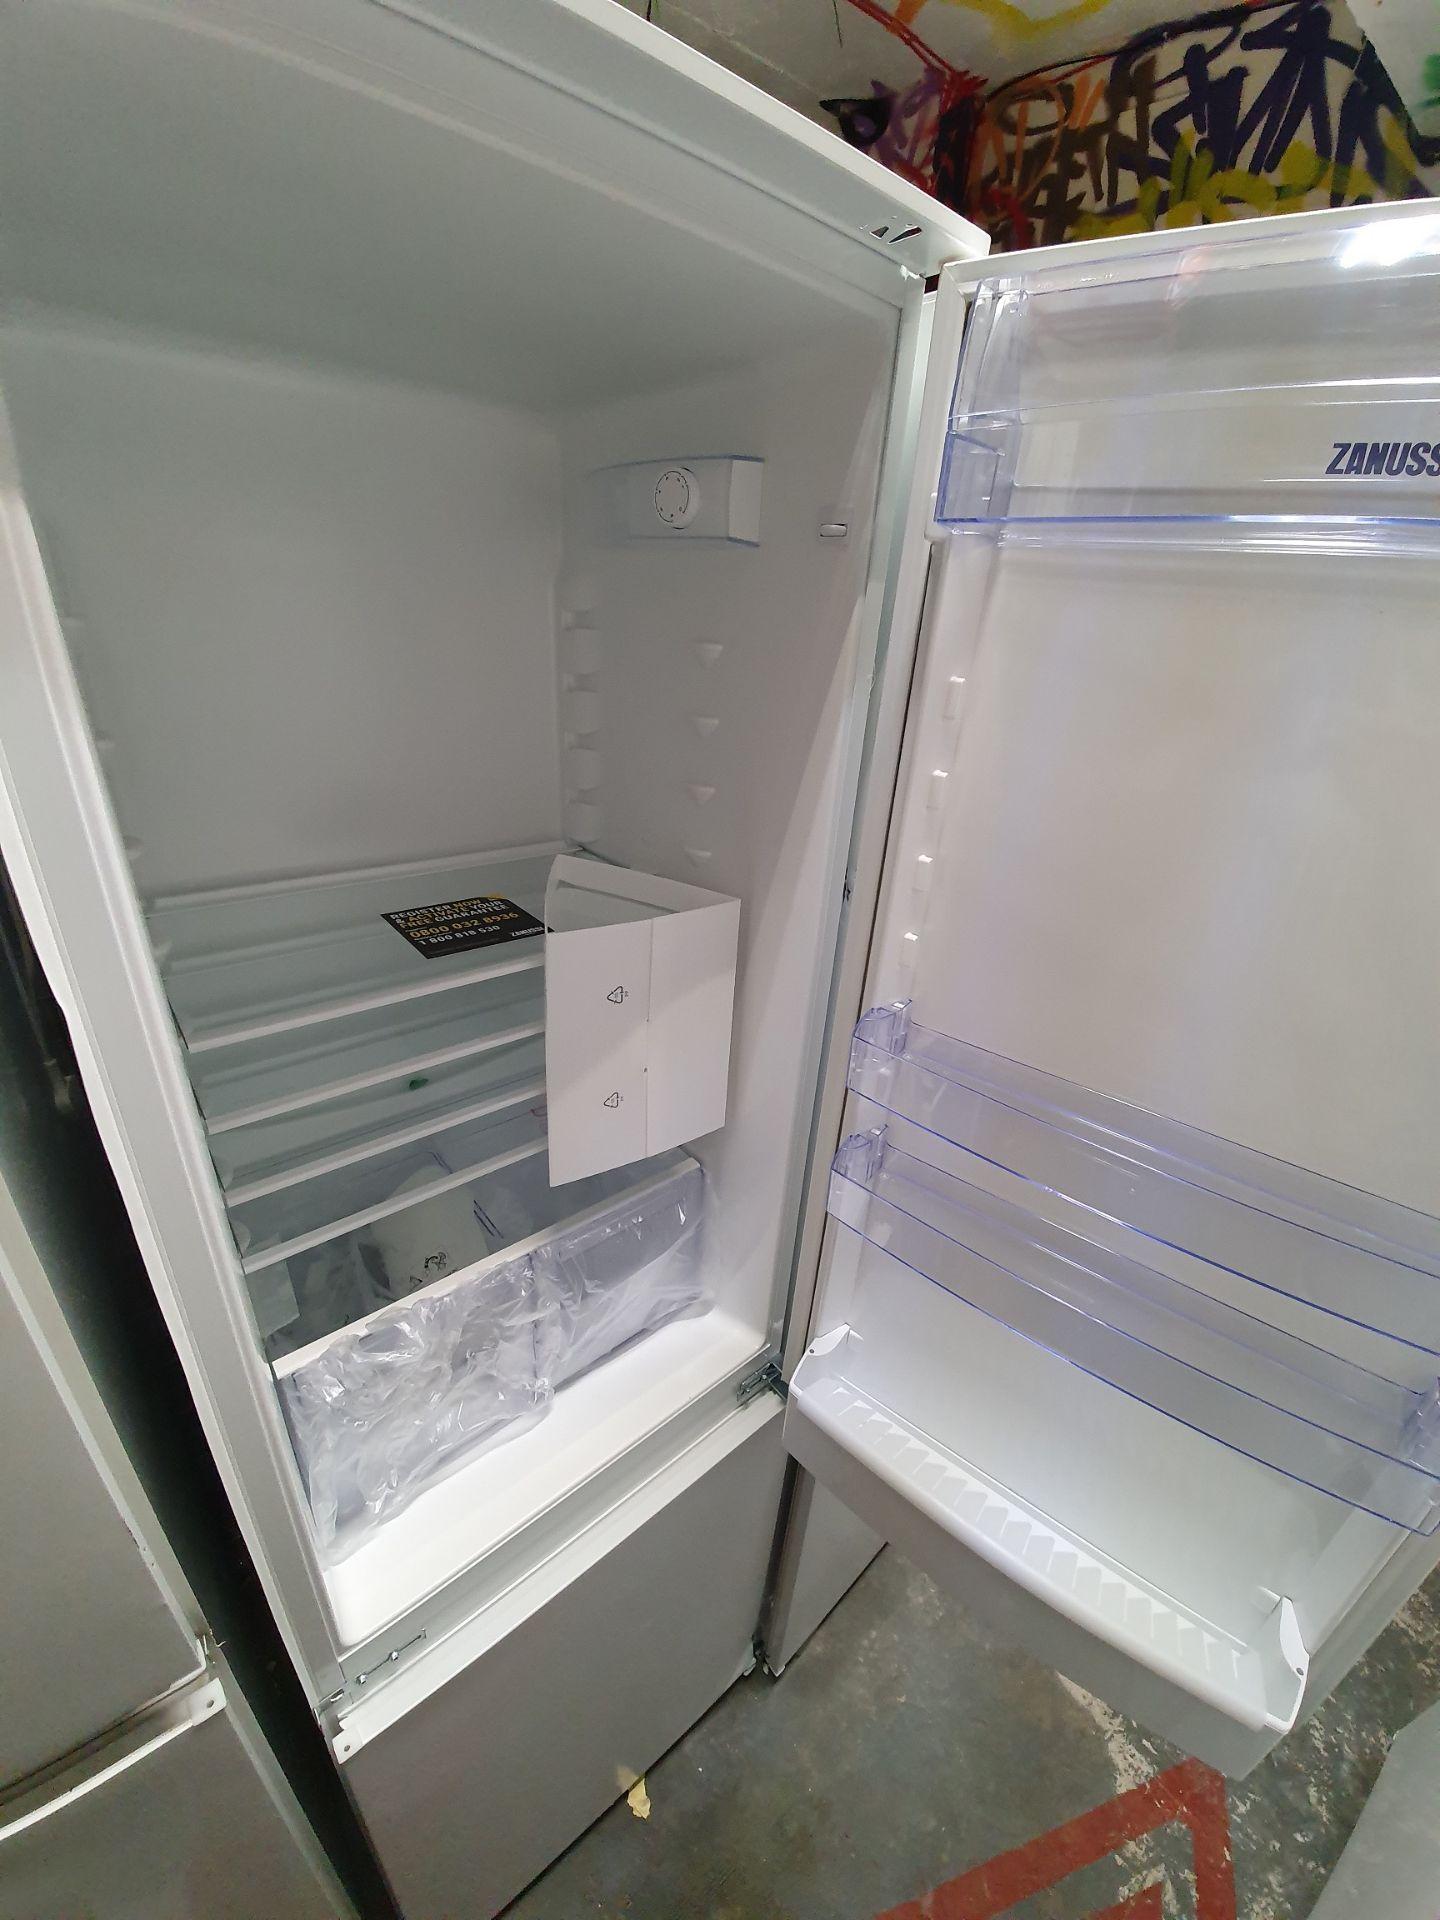 NEW/GRADED AND UNPACKAGED Prima PRRF702 Integrated Fridge Freezer (Brand new slight external - Image 9 of 14